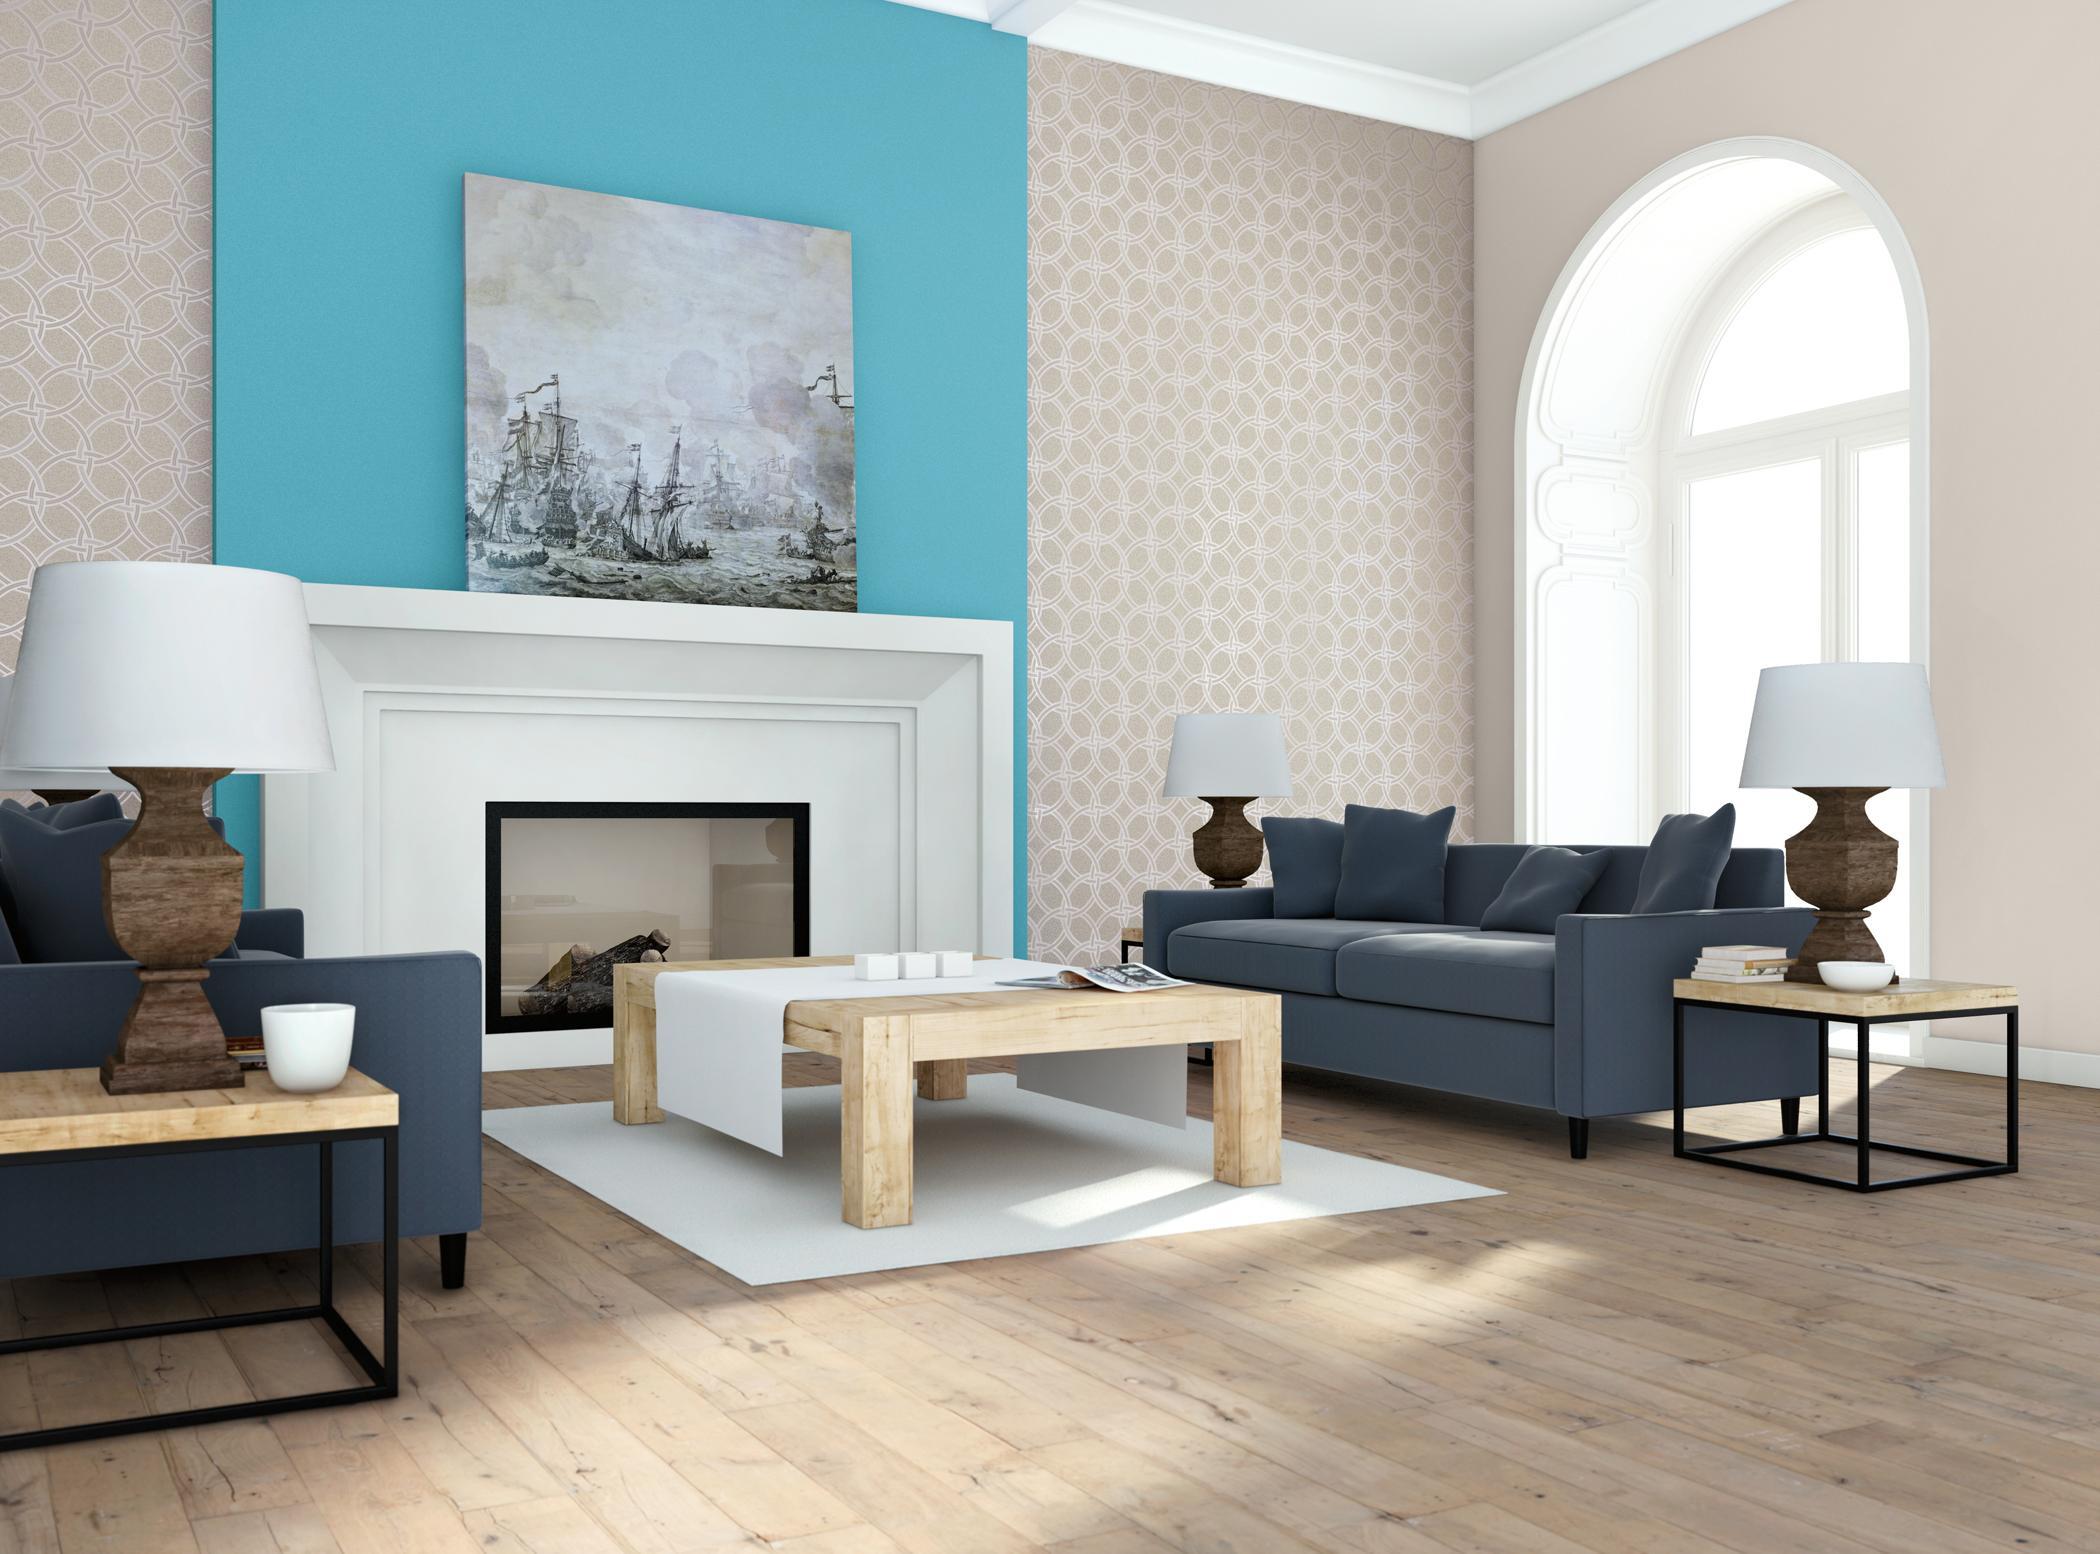 Türkisfarbene Wandgestaltung Hinter Dem Kamin #couchtisch #beistelltisch  #kamin #wandgestaltung #sofa #